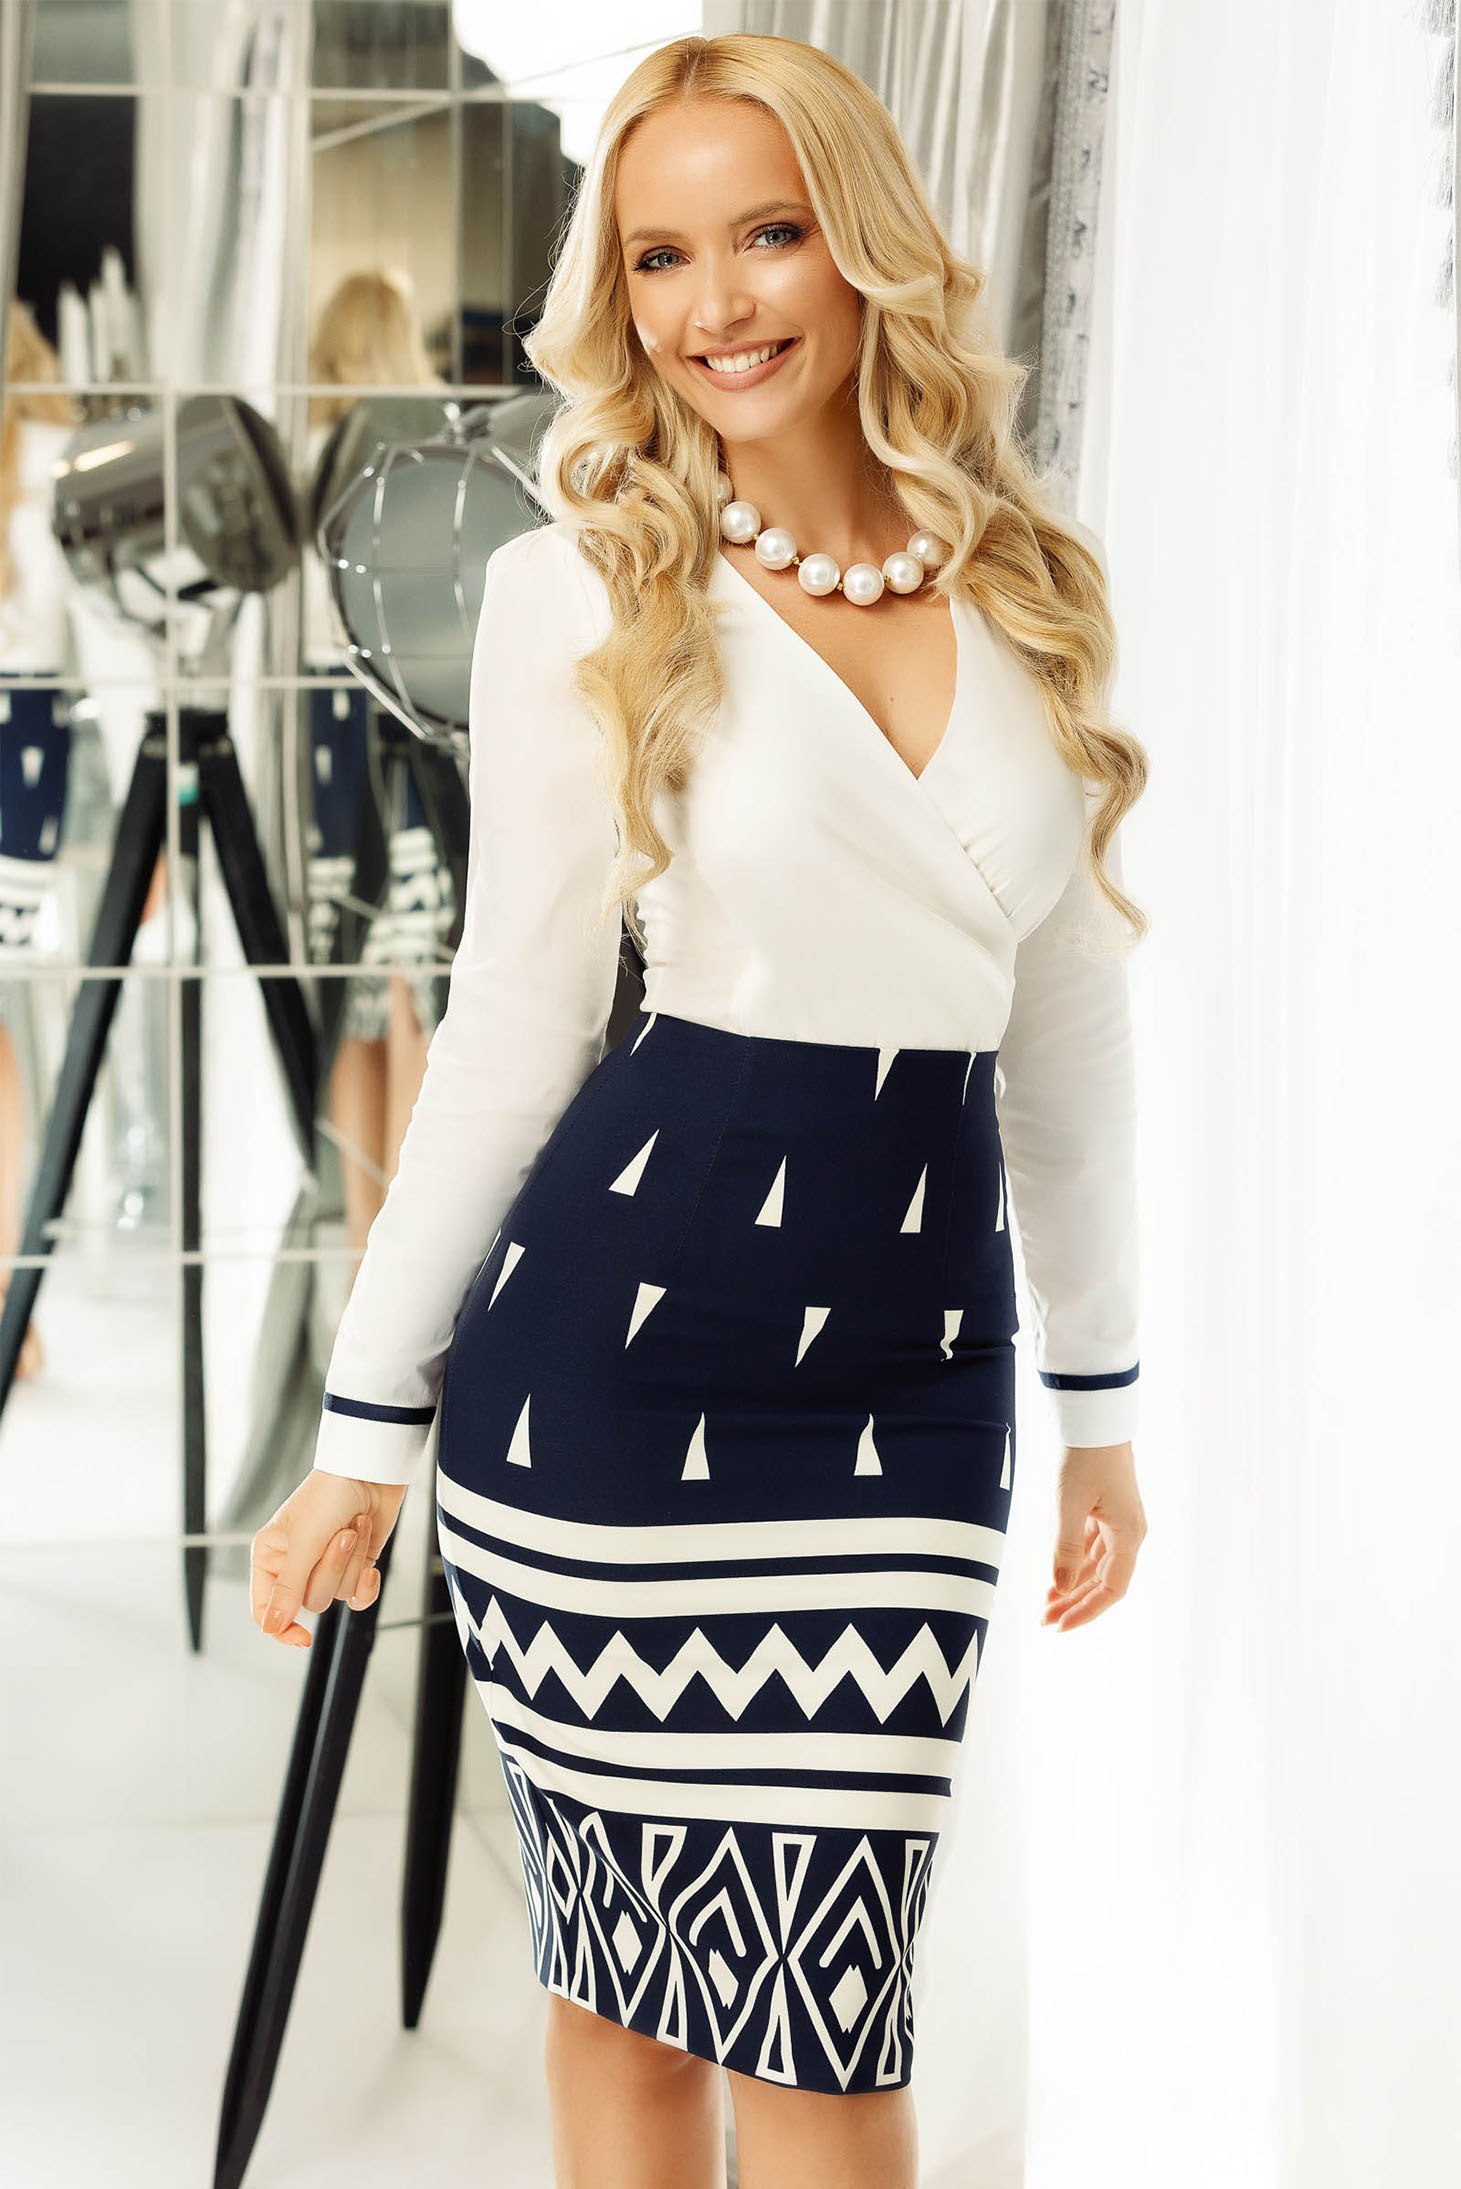 Fofy darkblue office midi pencil skirt slightly elastic fabric high waisted